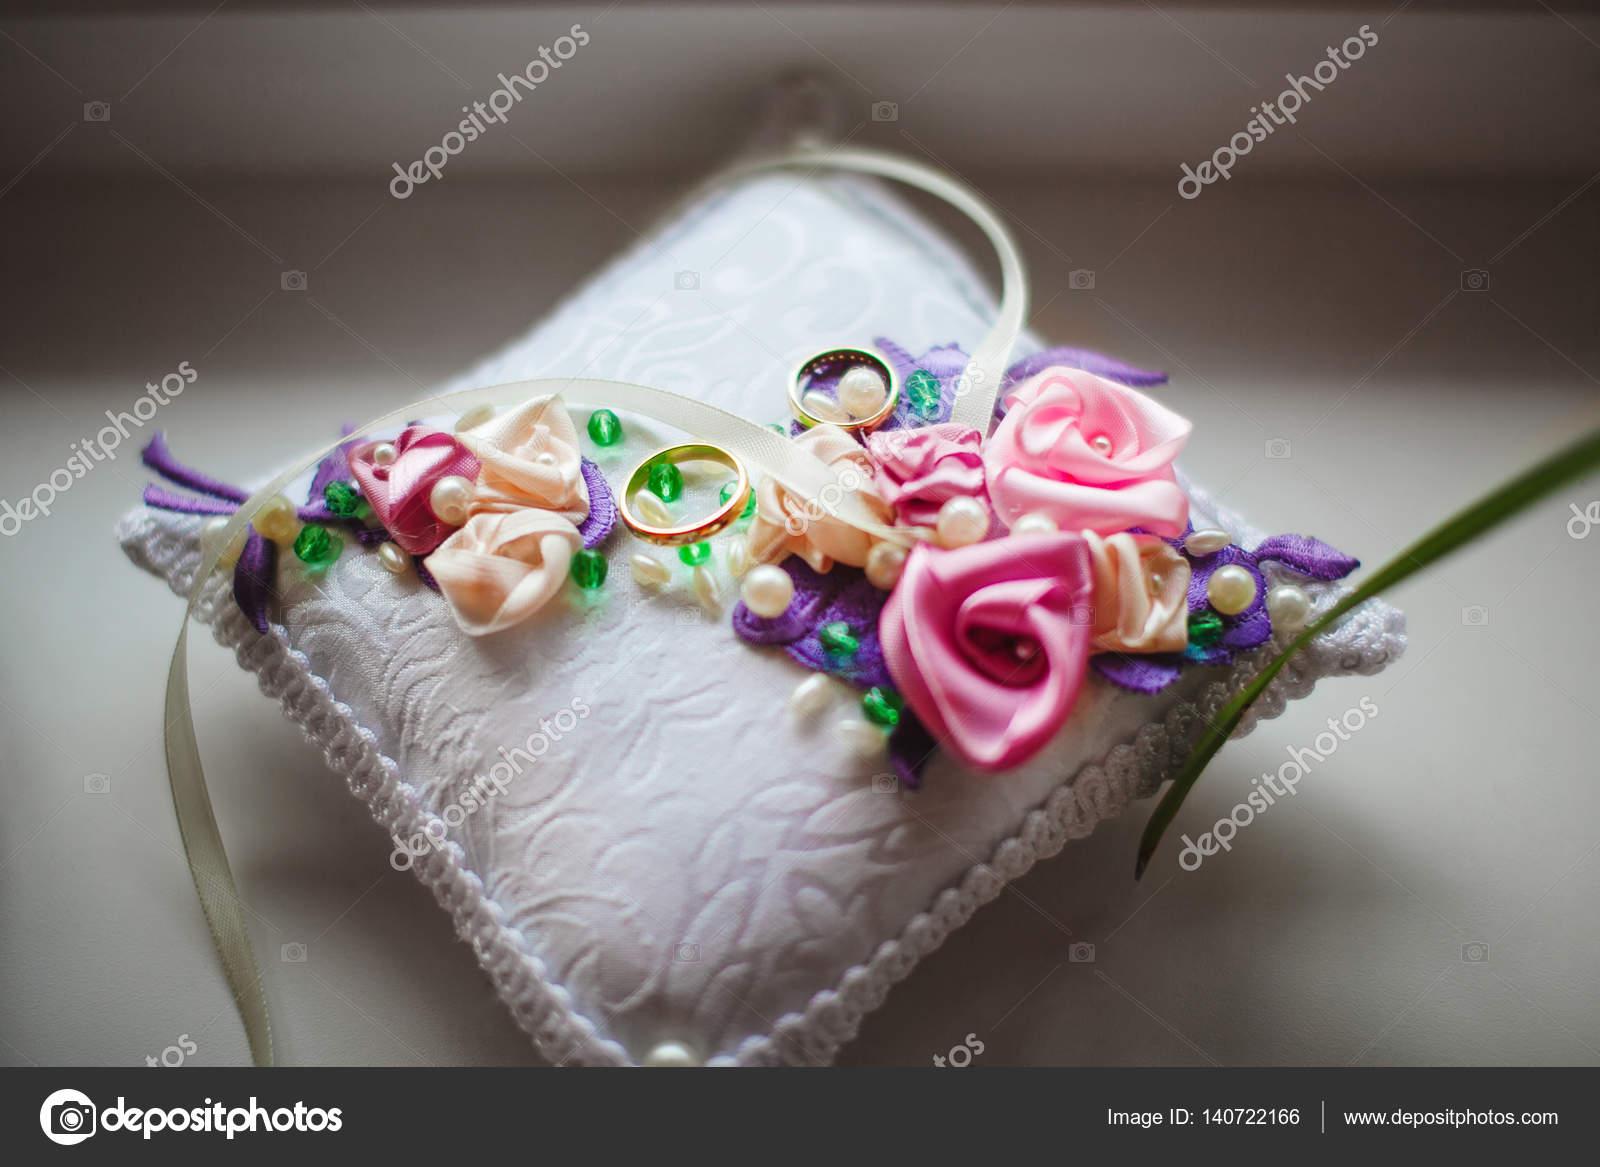 Vigselringar på kudde med blommor a391b6bff3944